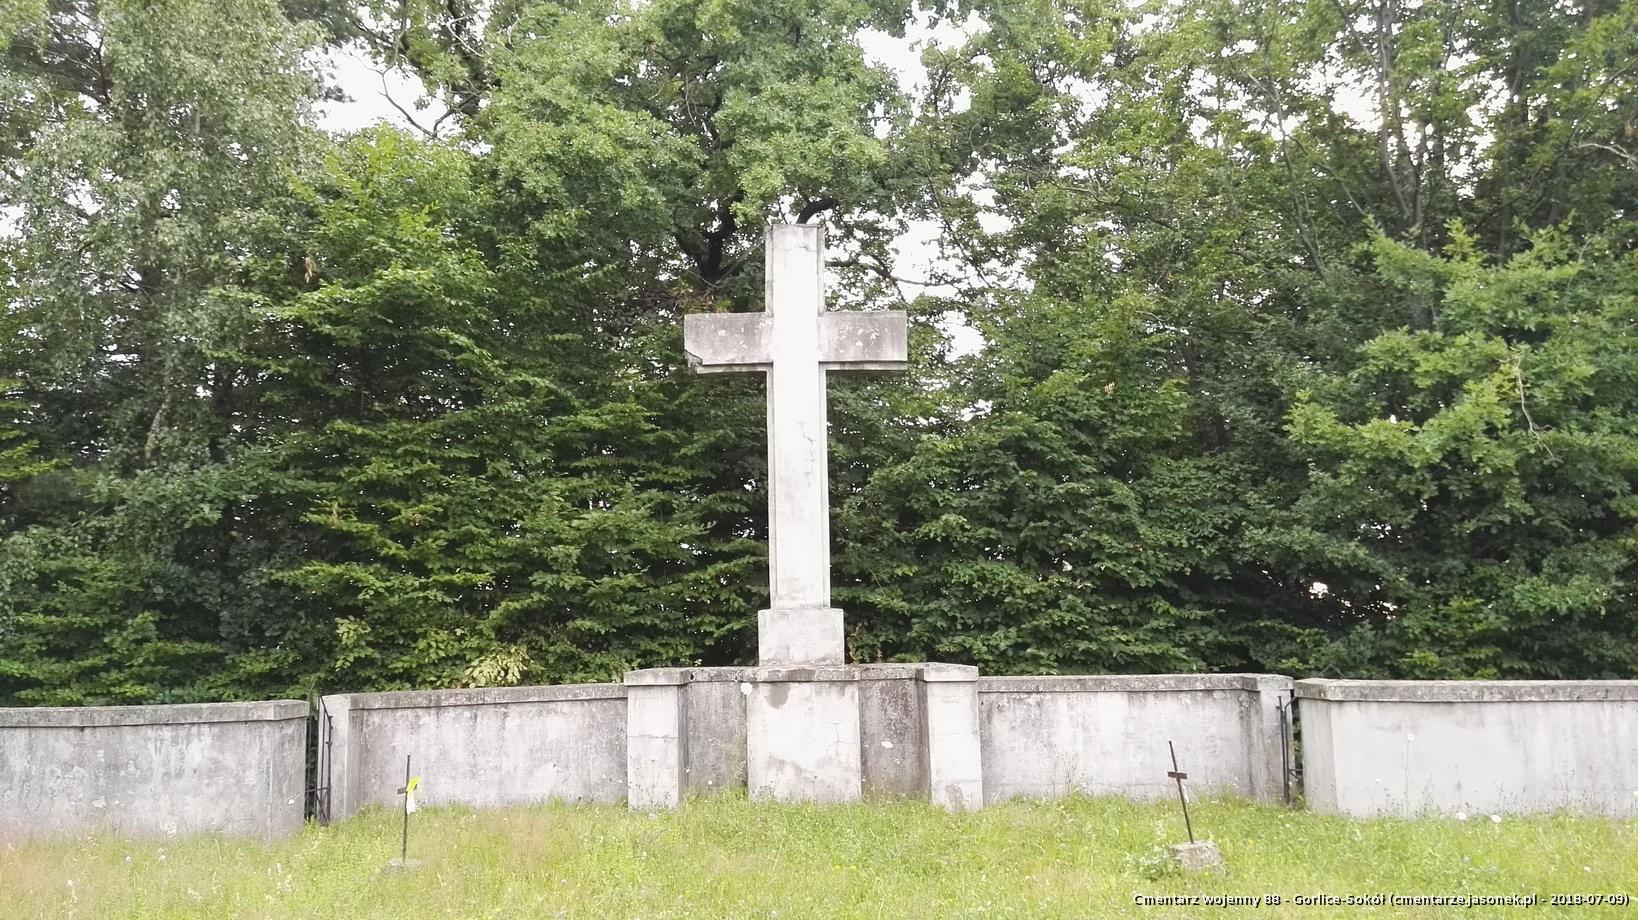 Cmentarz wojenny 88 - Gorlice-Sokół